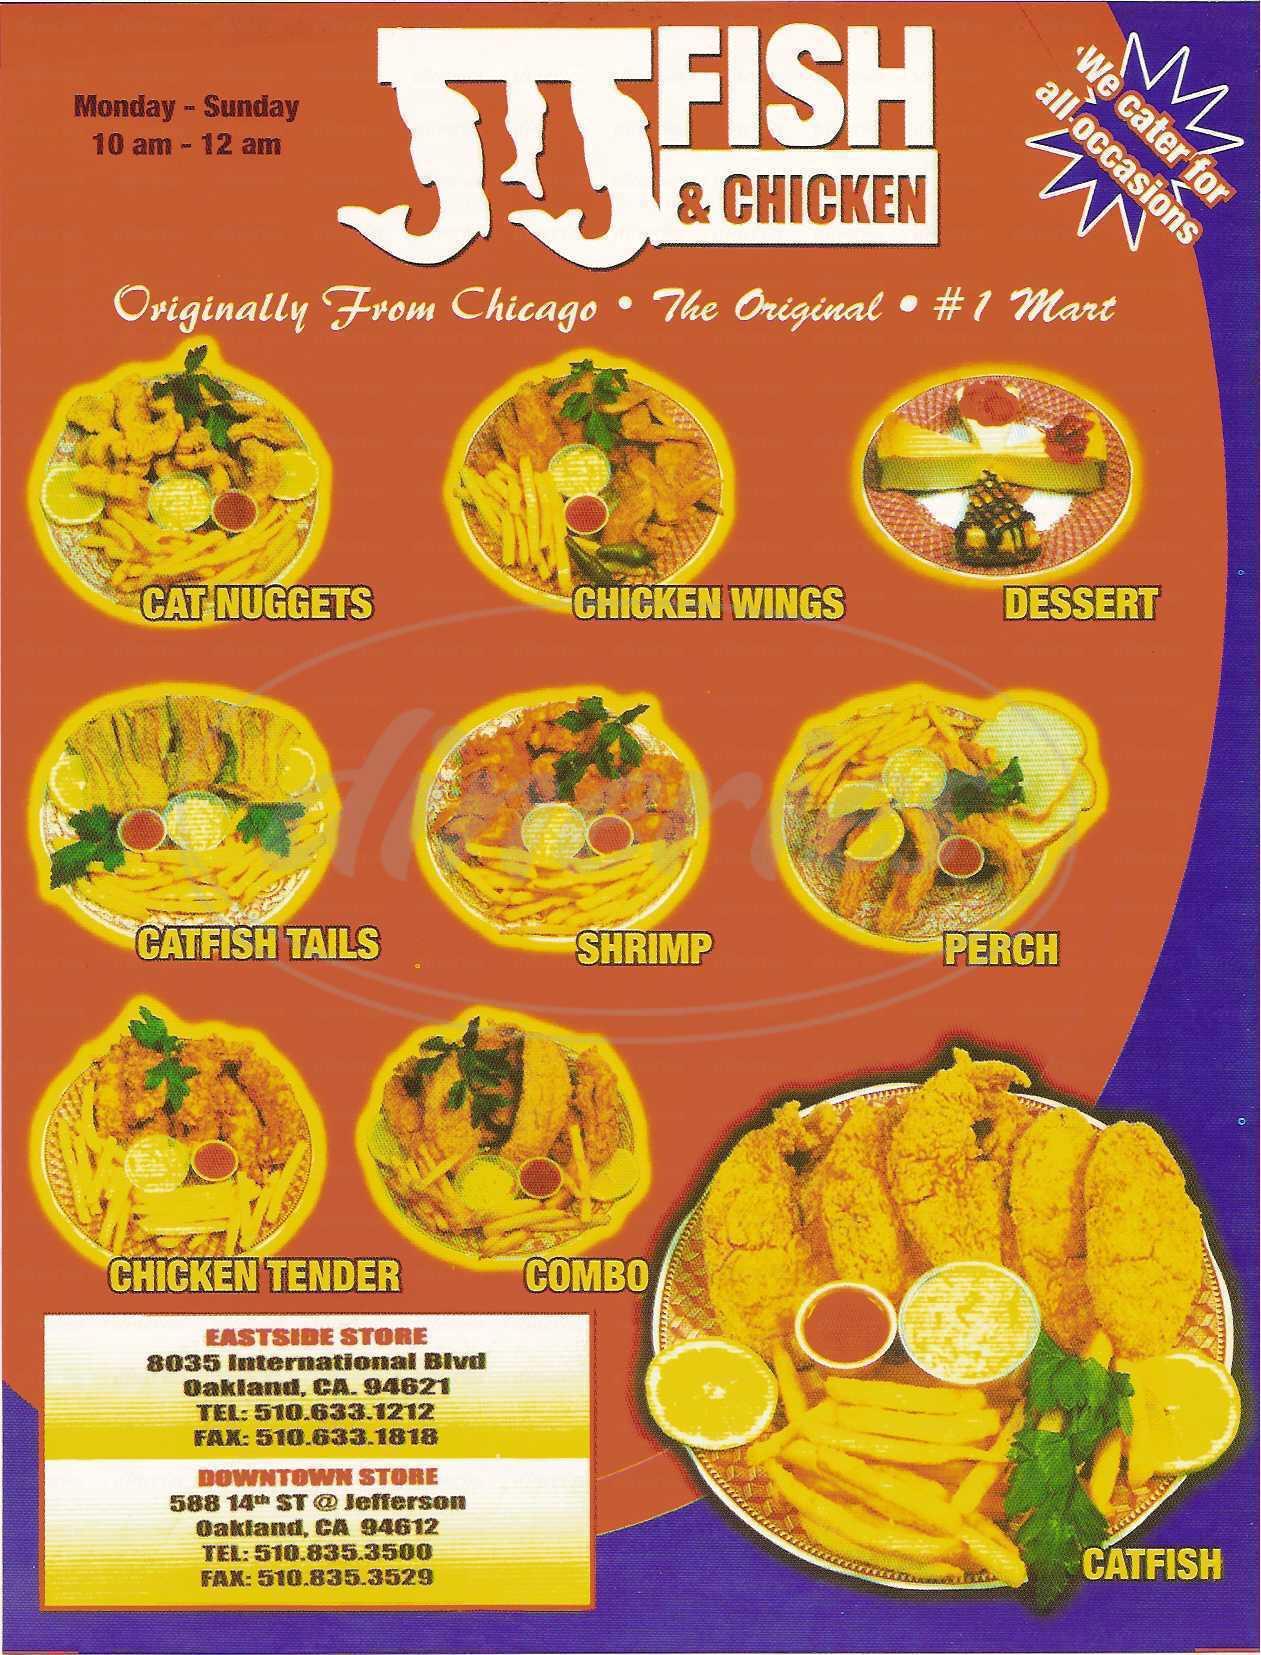 Jj fish chicken menu oakland dineries for Jr fish and chicken menu